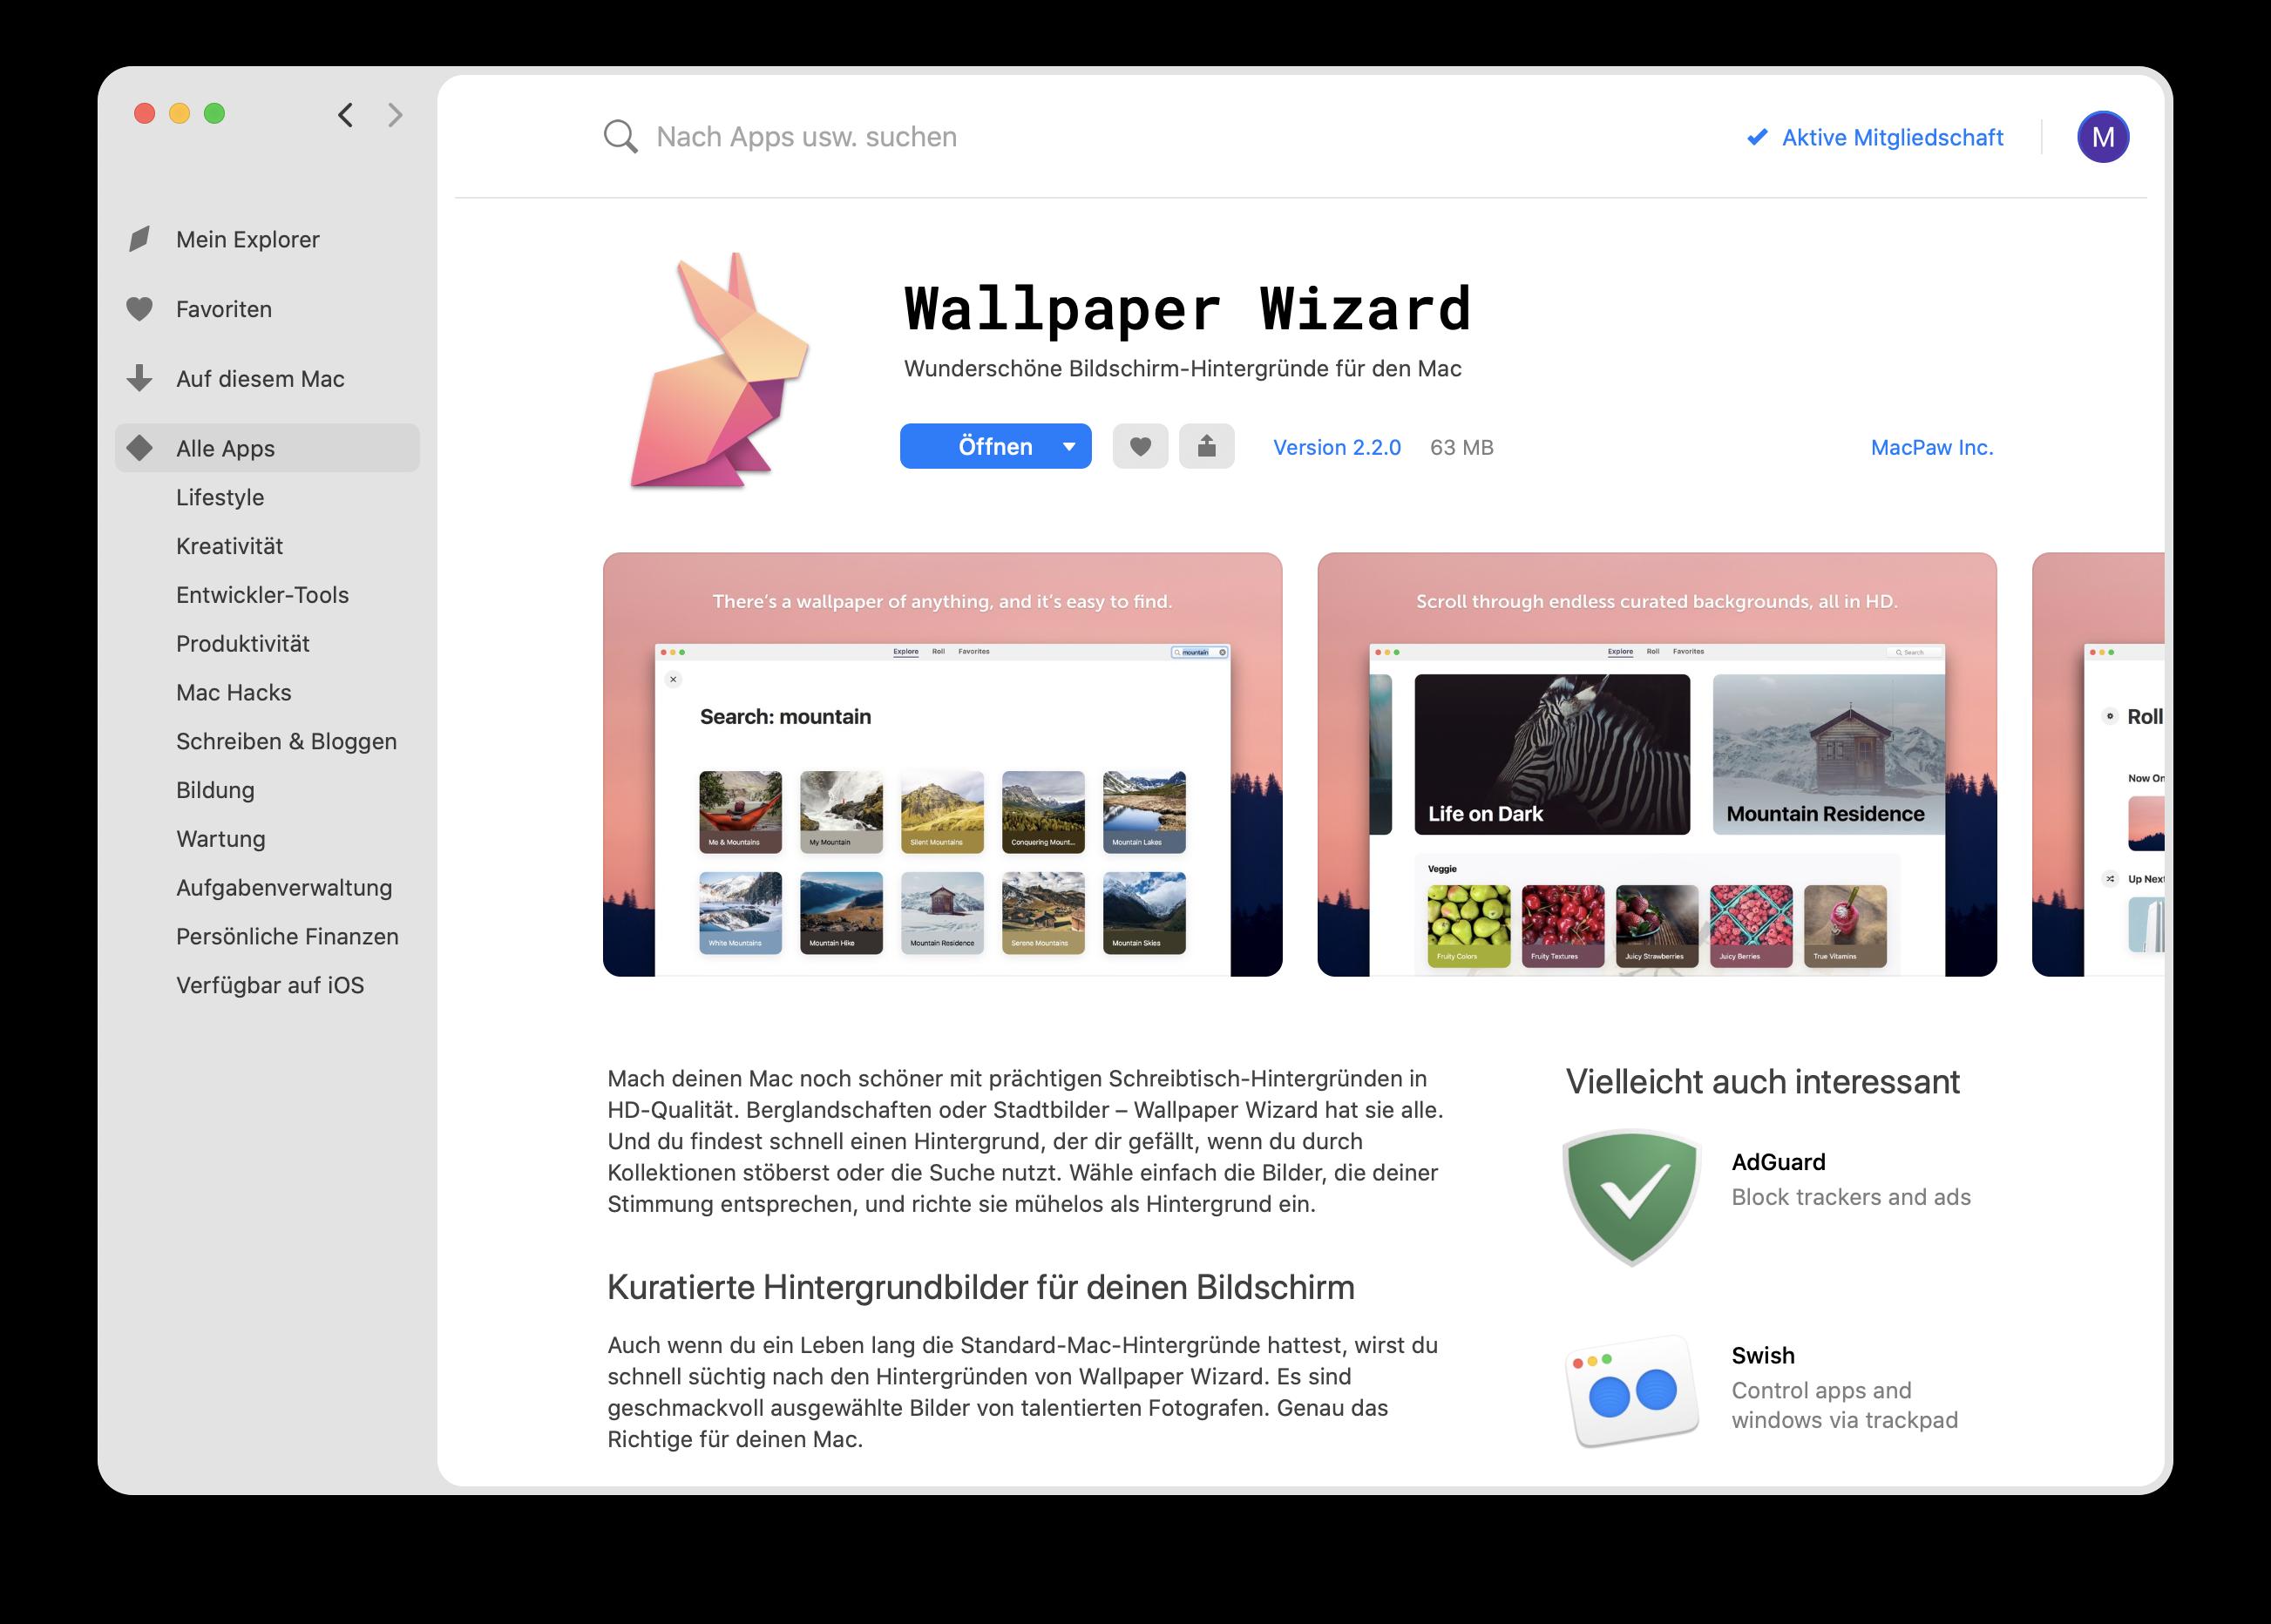 Wallpaper Wizard-App